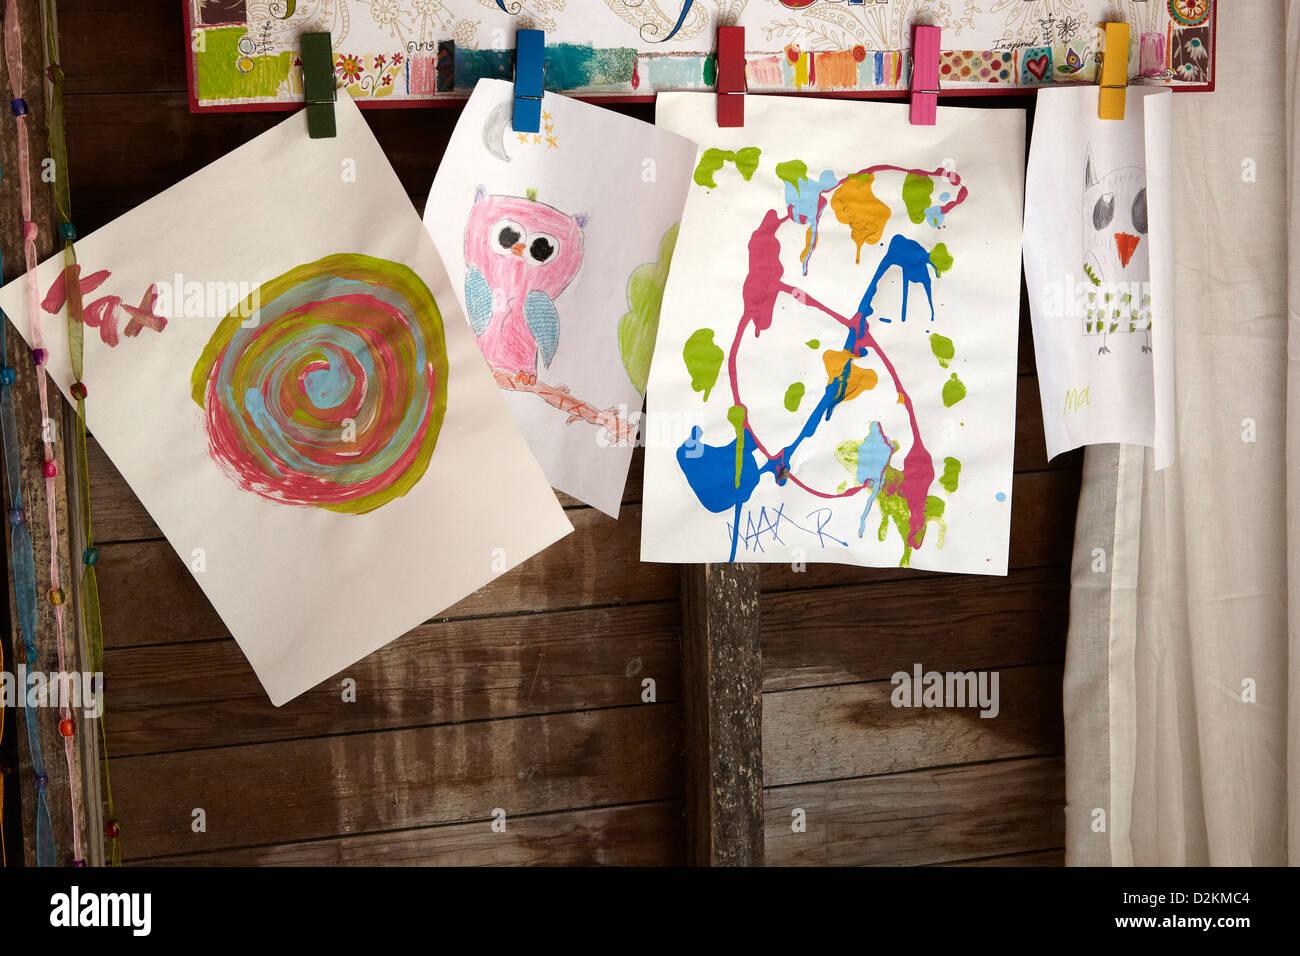 Children art work displayed - Stock Image